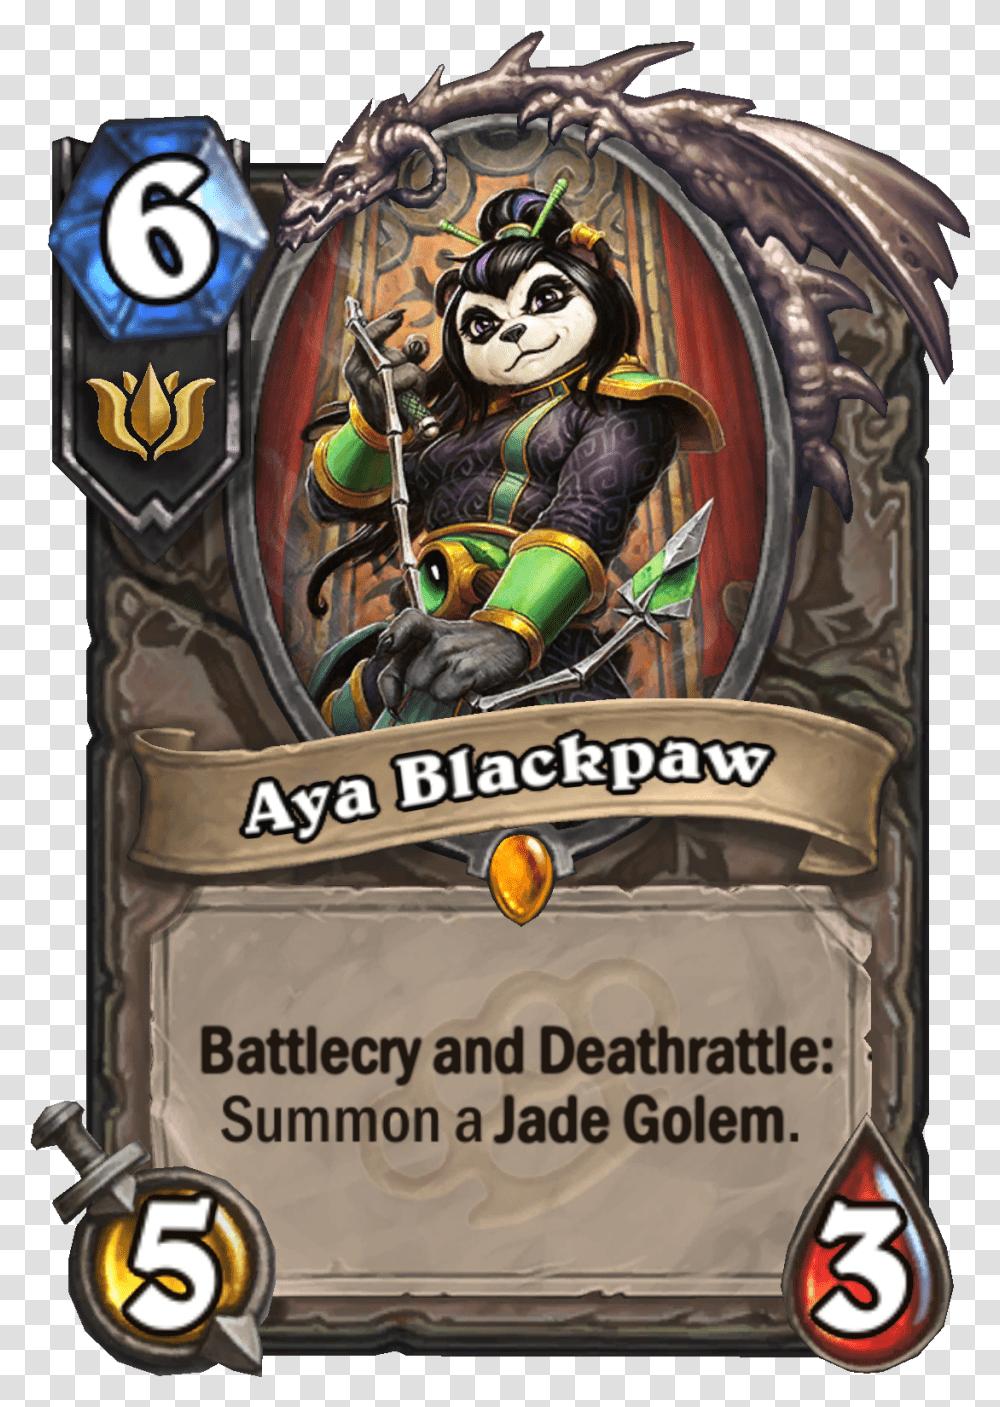 Aya Blackpaw Wow